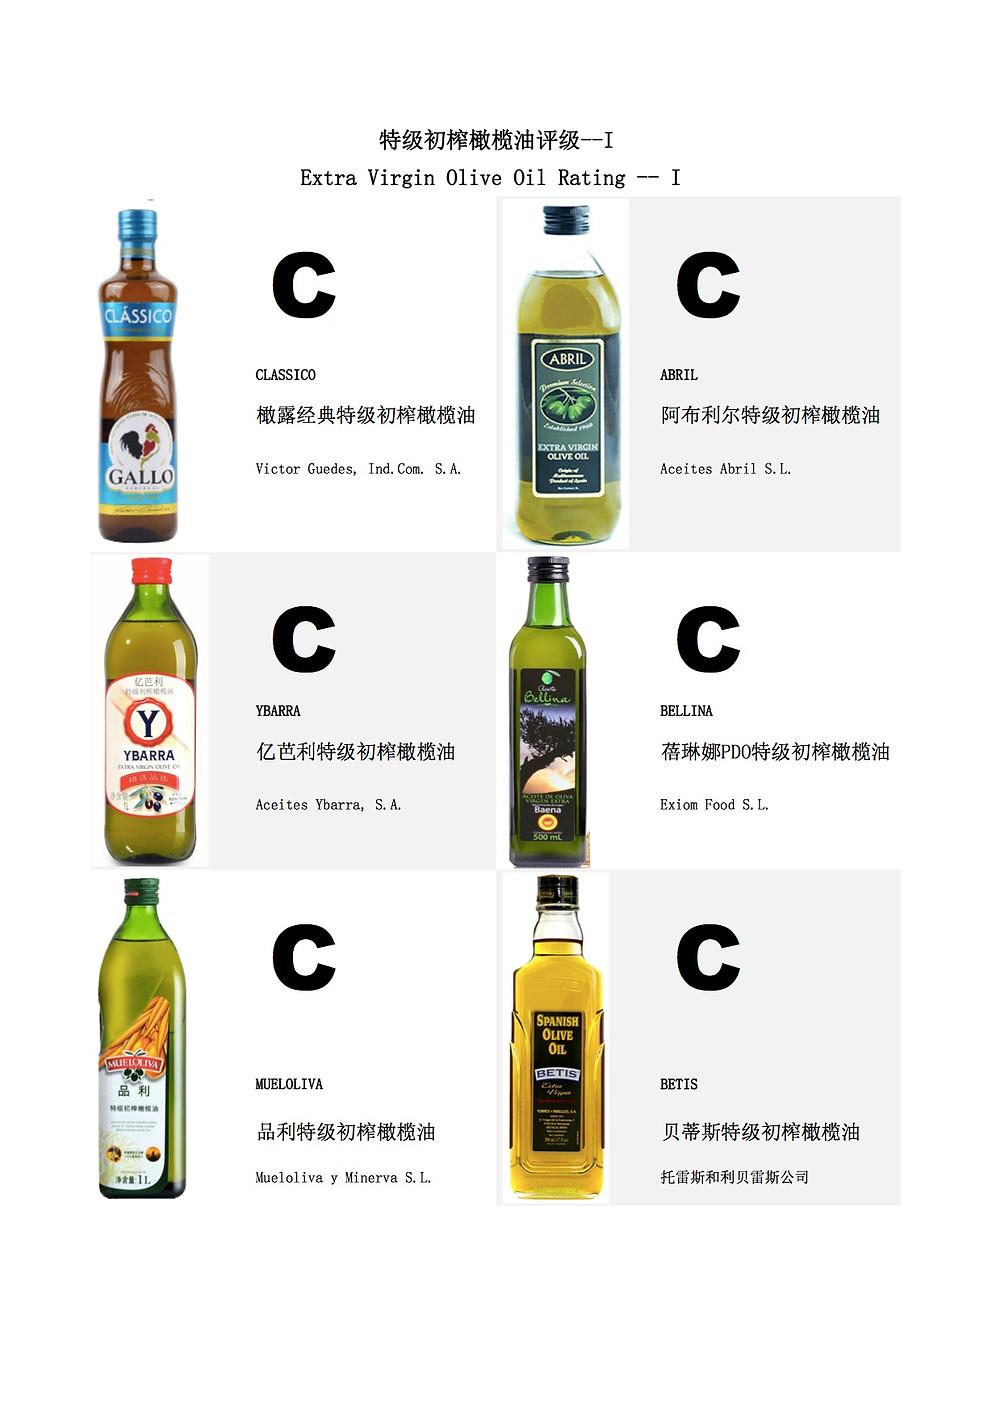 Extra Virgin Olive Oil Rating I - Okoer Report